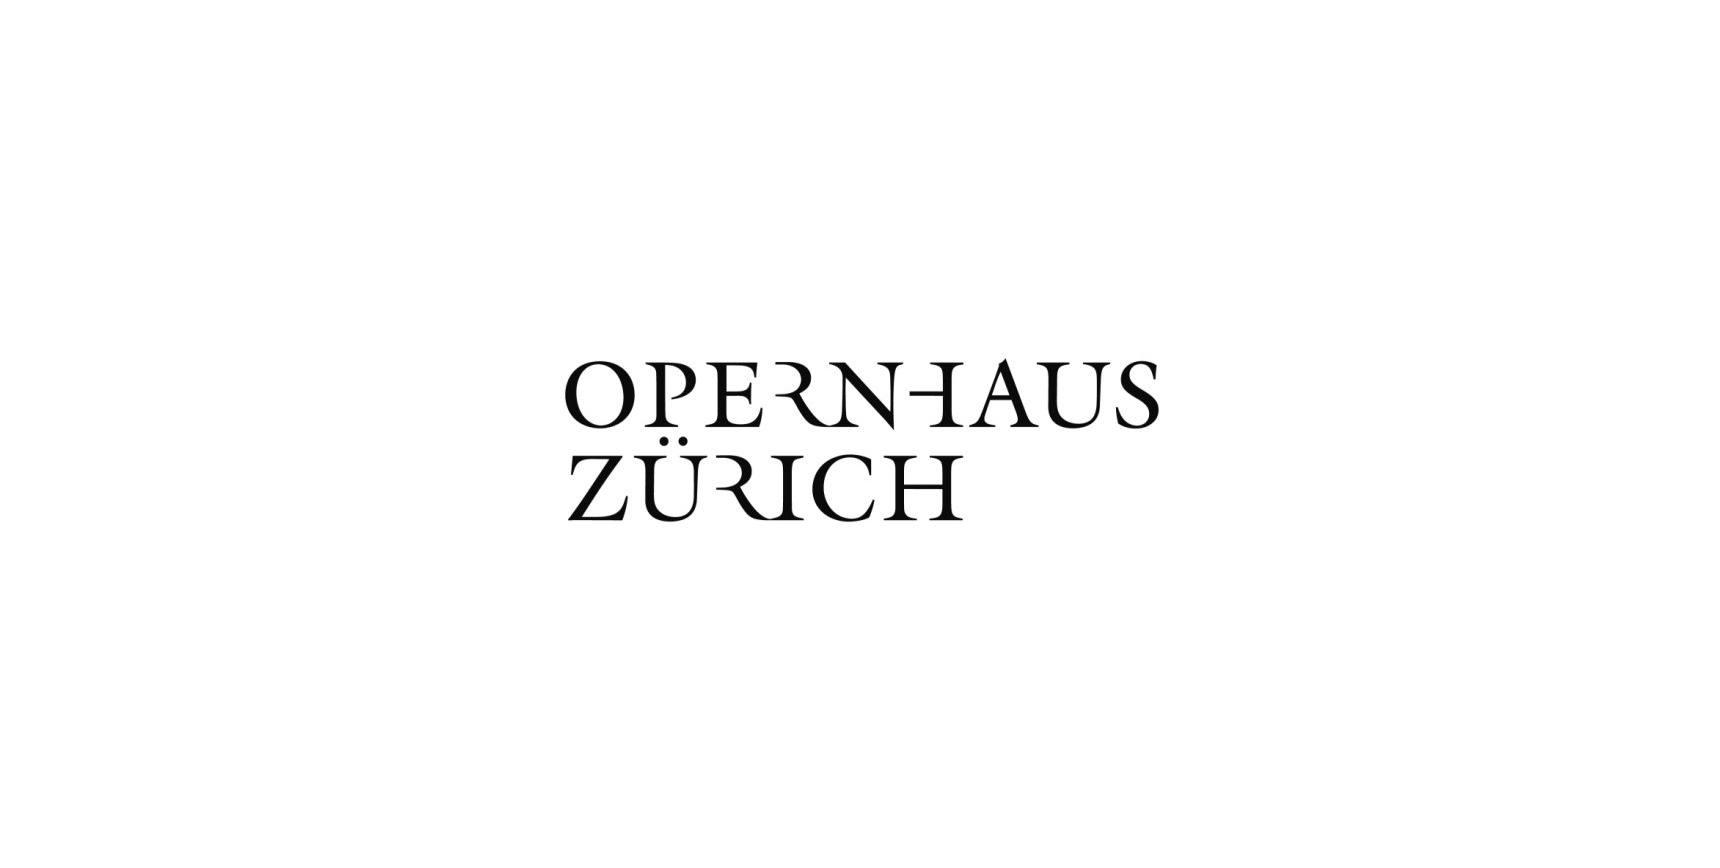 Zurich Opera announces season 21/22